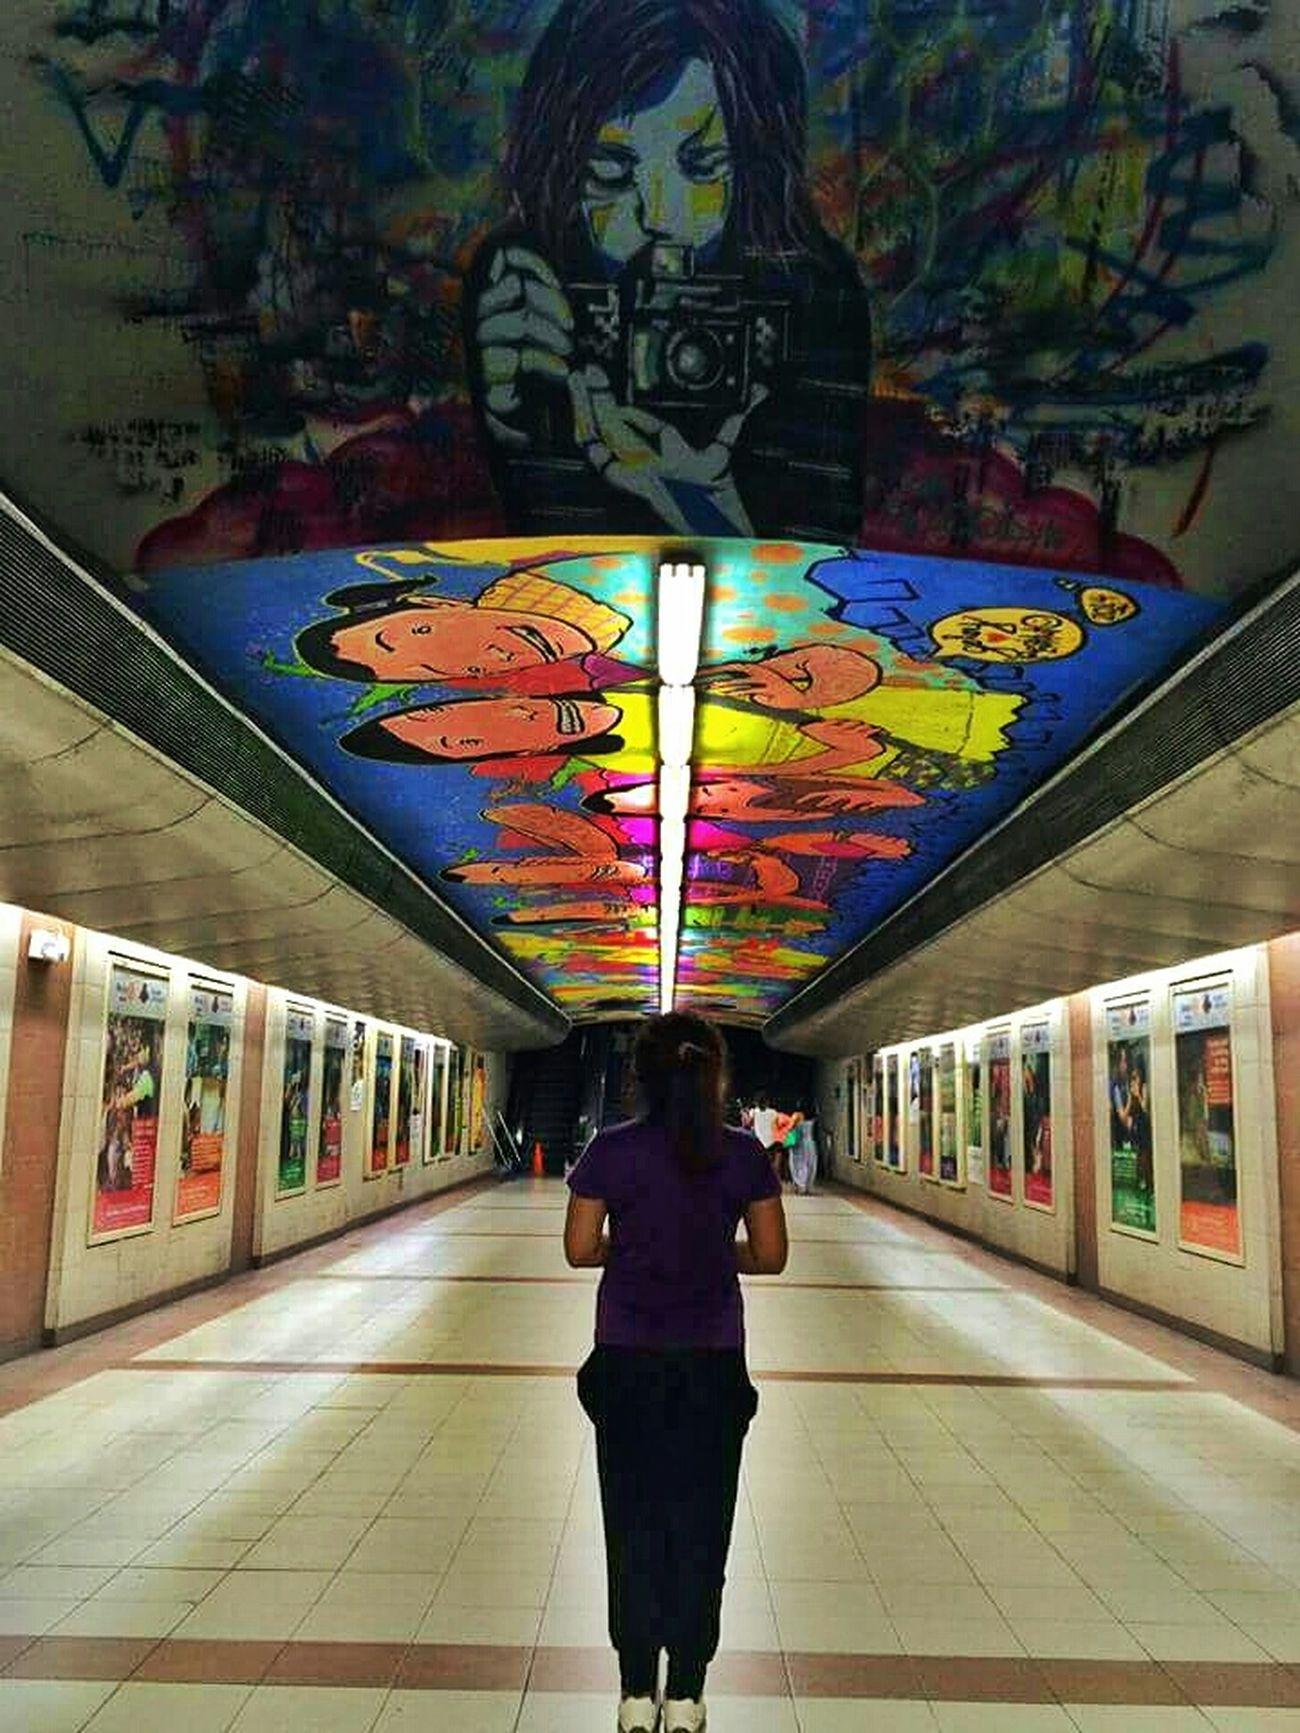 Underpass Ayala Walkway Graffitti ArtWork Photography Mural Wall Art